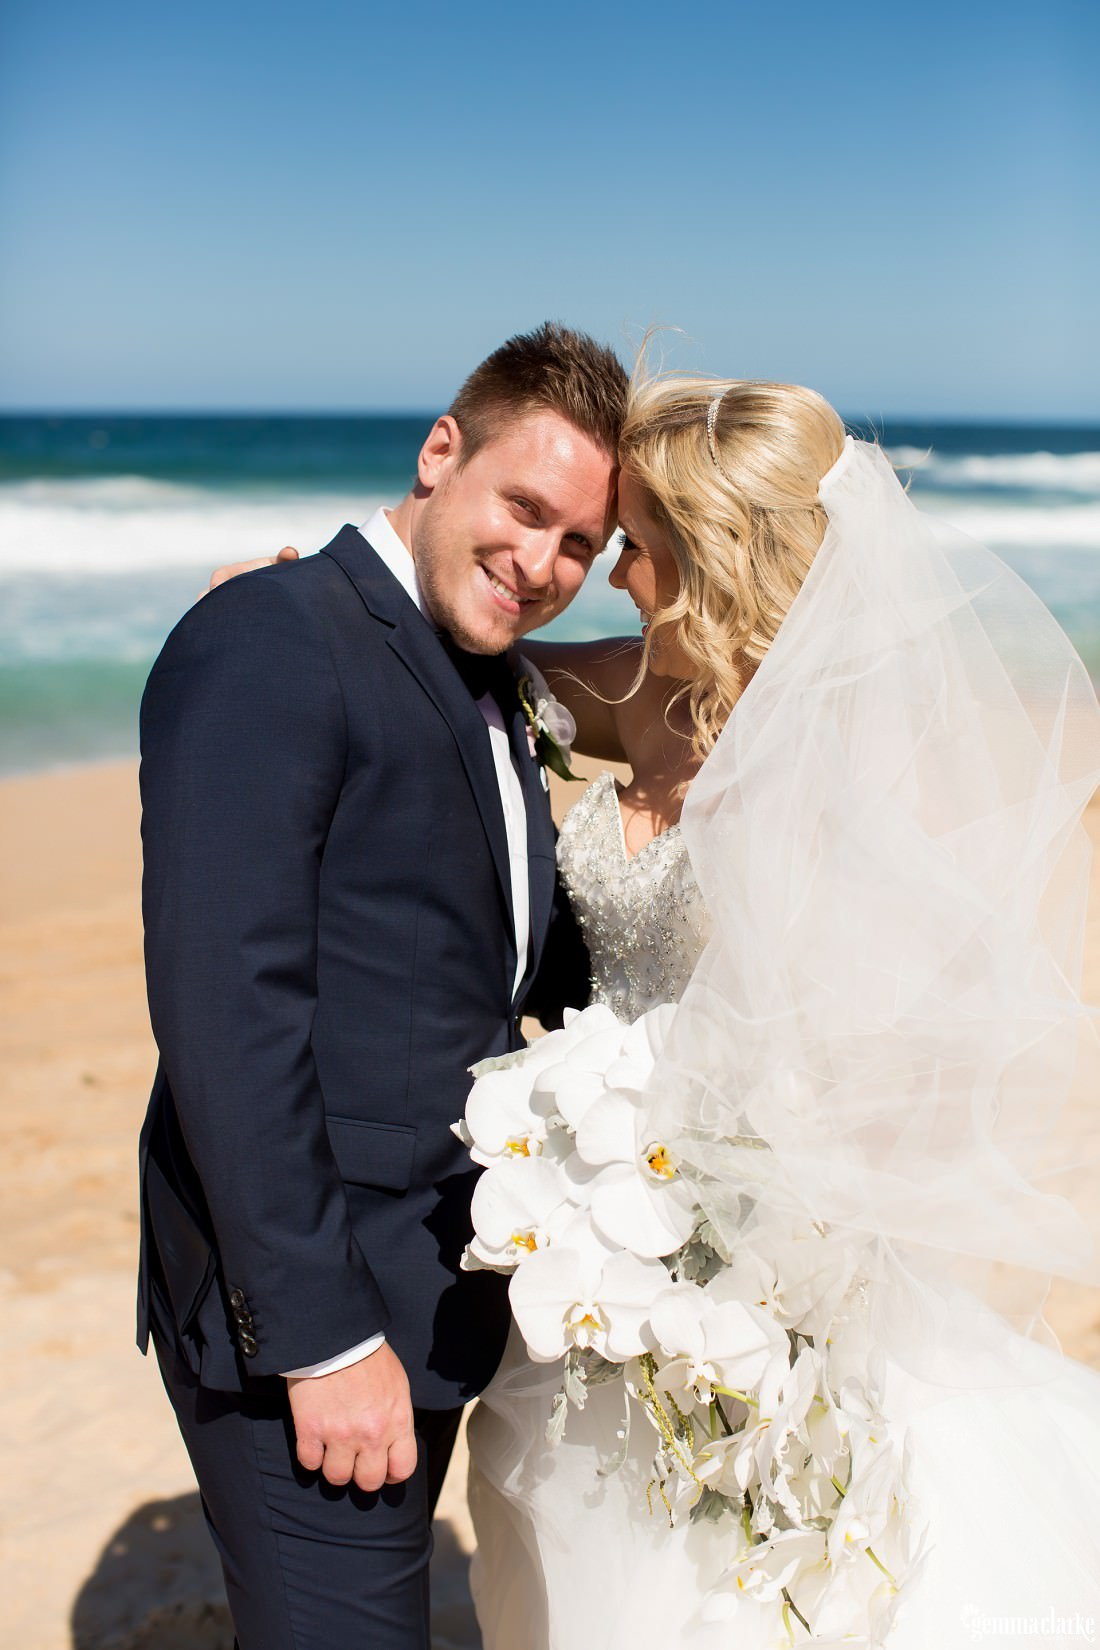 gemmaclarkephotography_maroubra-beach-wedding_fun-wedding_olivia-and-fredrik_0037